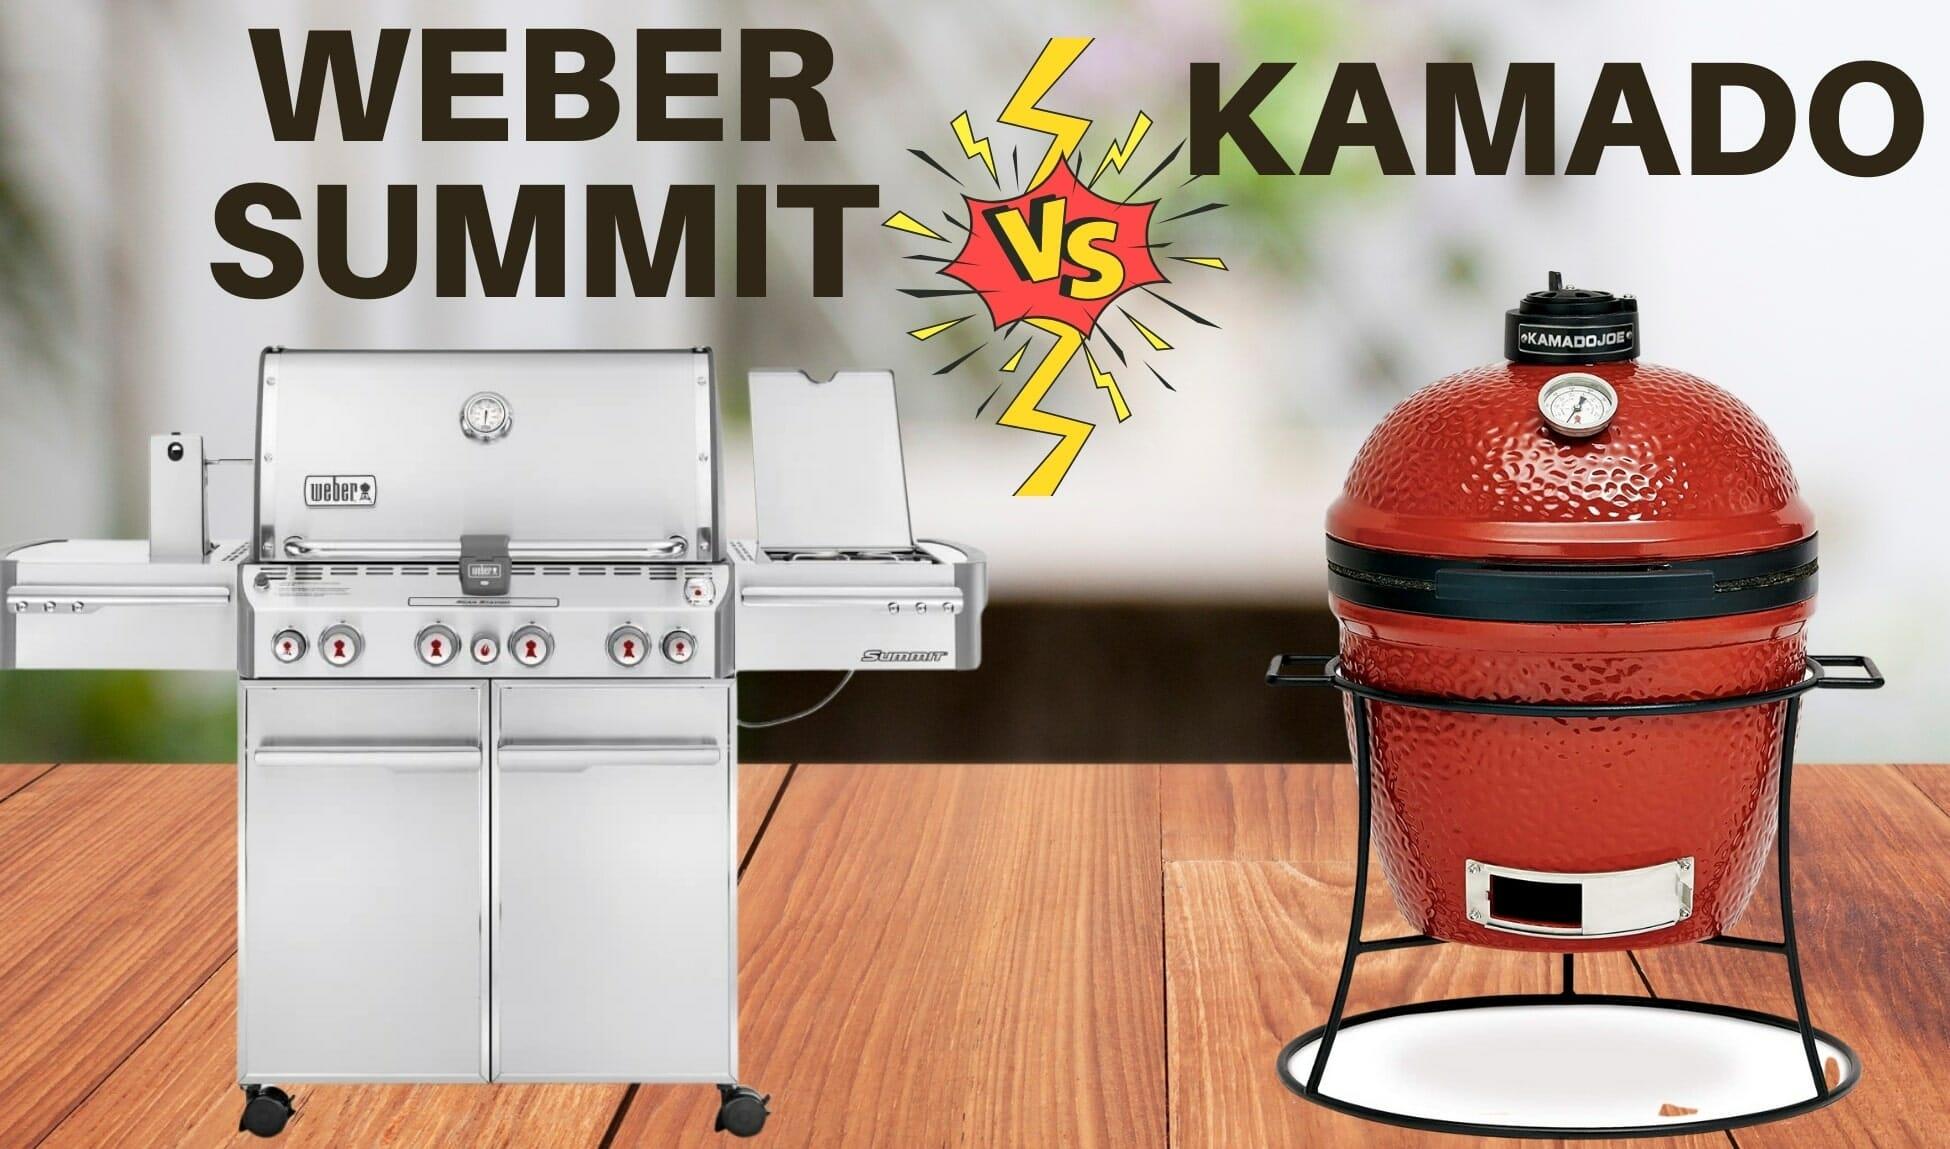 weber summit vs kamado